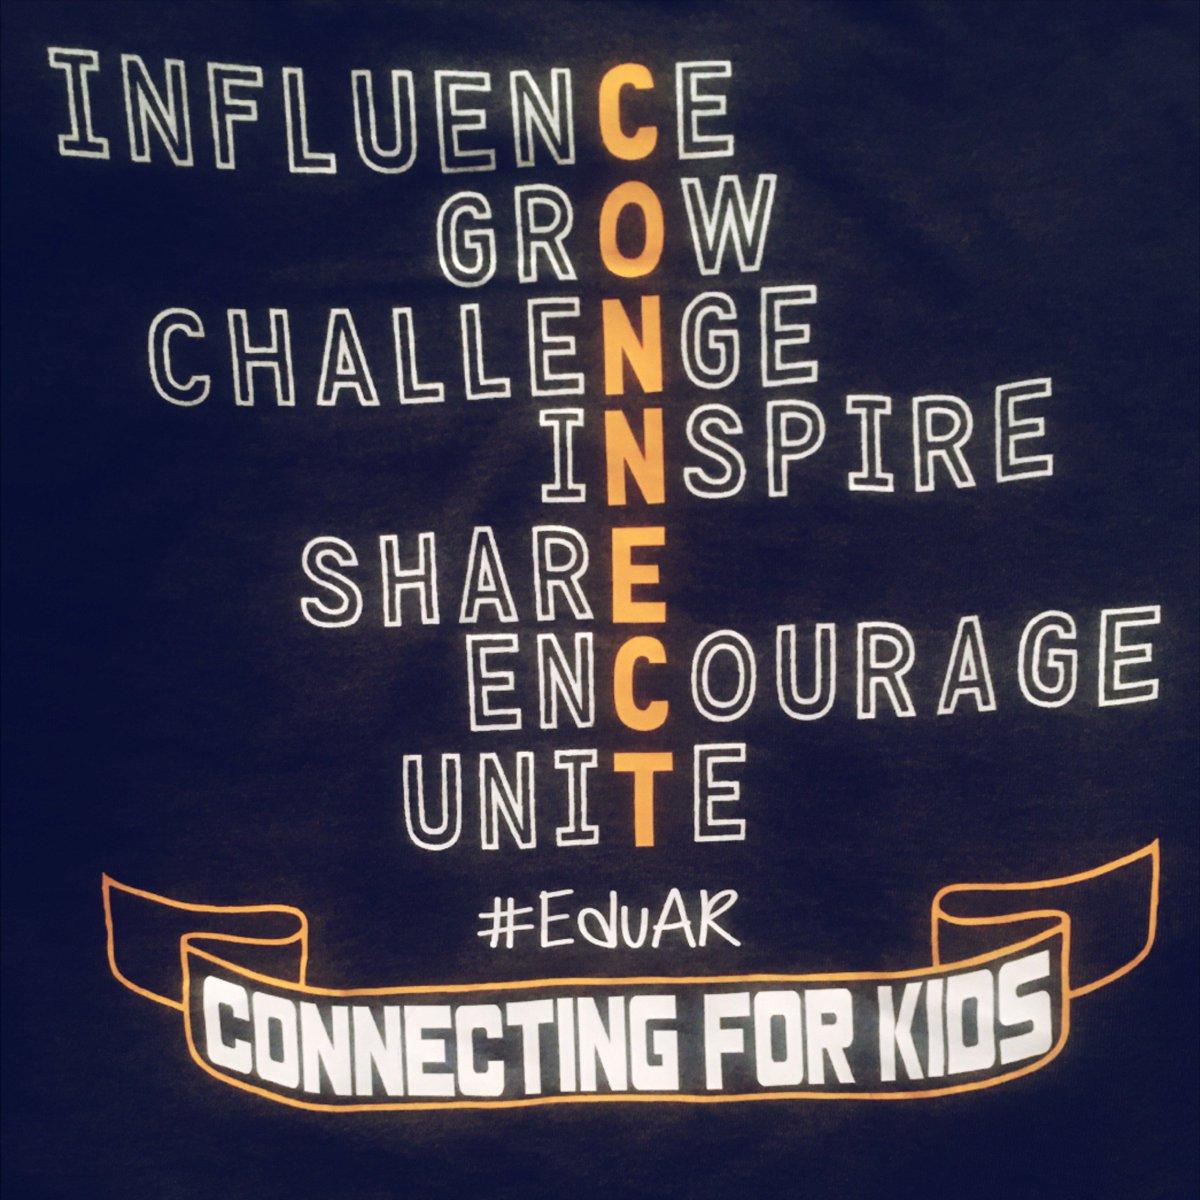 Our mantra in #EduAR is 'Connecting for Kids'. We are better together! @nortnik @Lindsey_Bohler